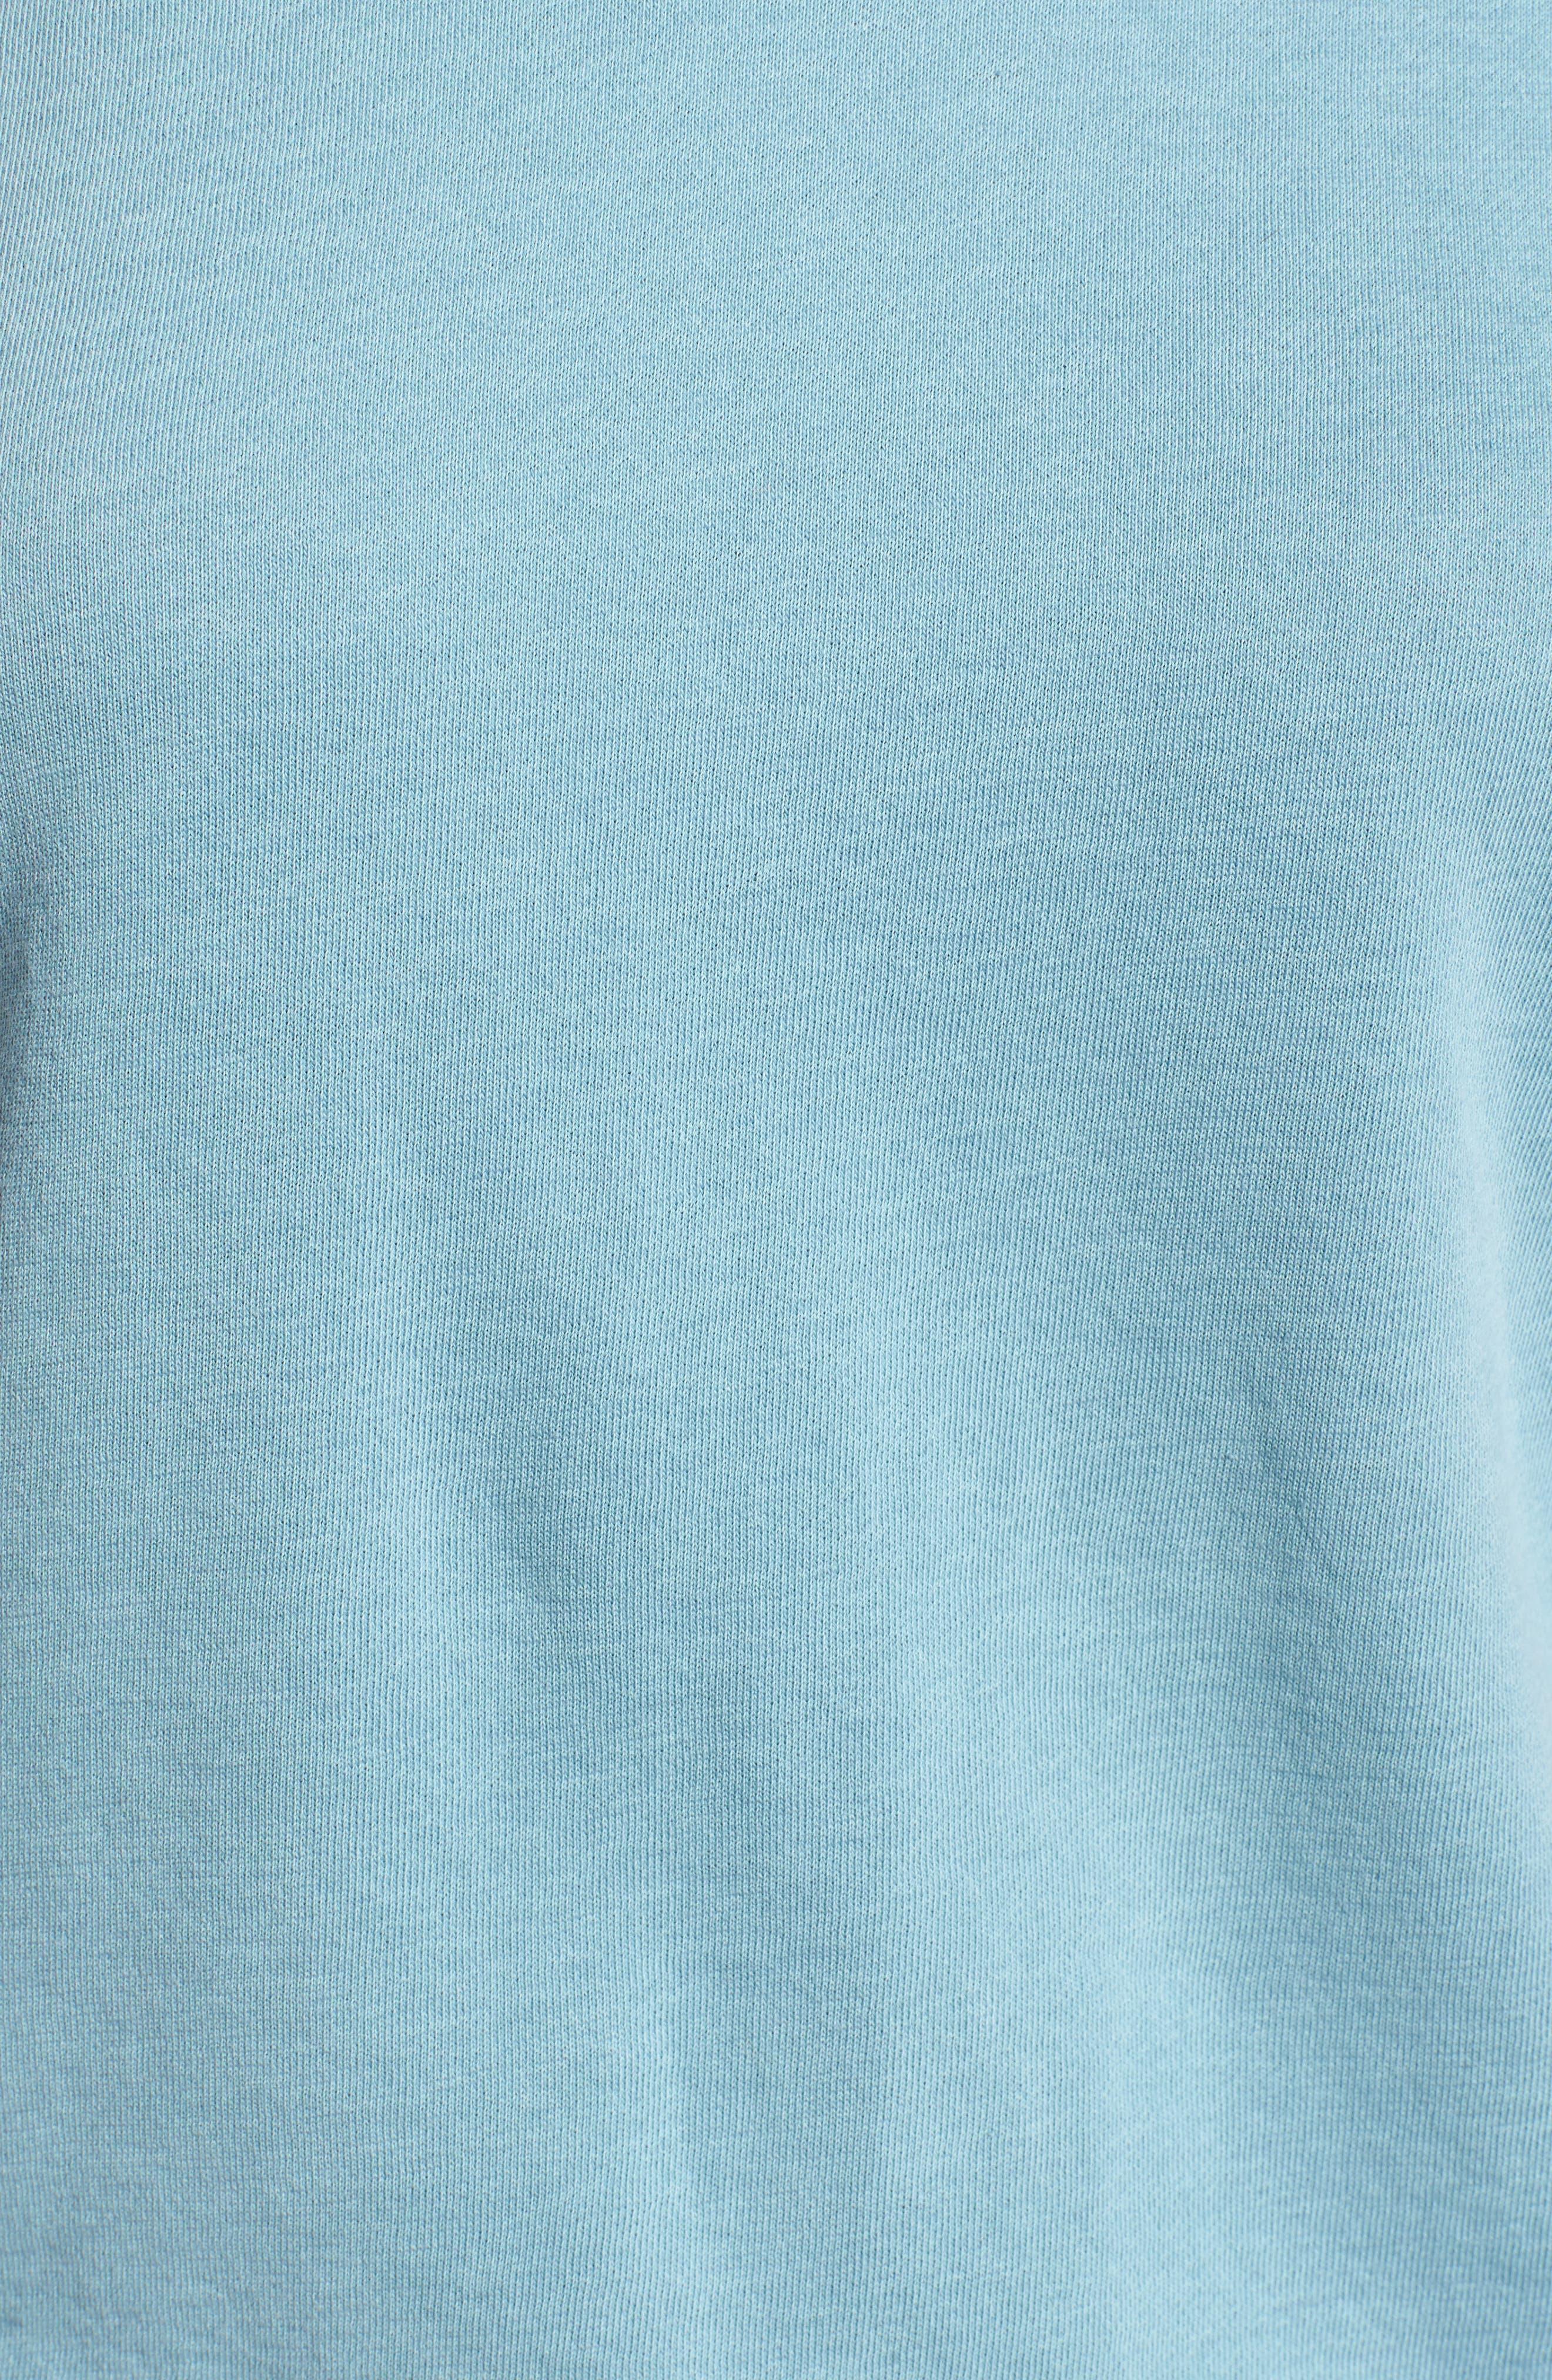 Alternate Image 5  - James Perse Raglan Sleeve Cotton Pullover